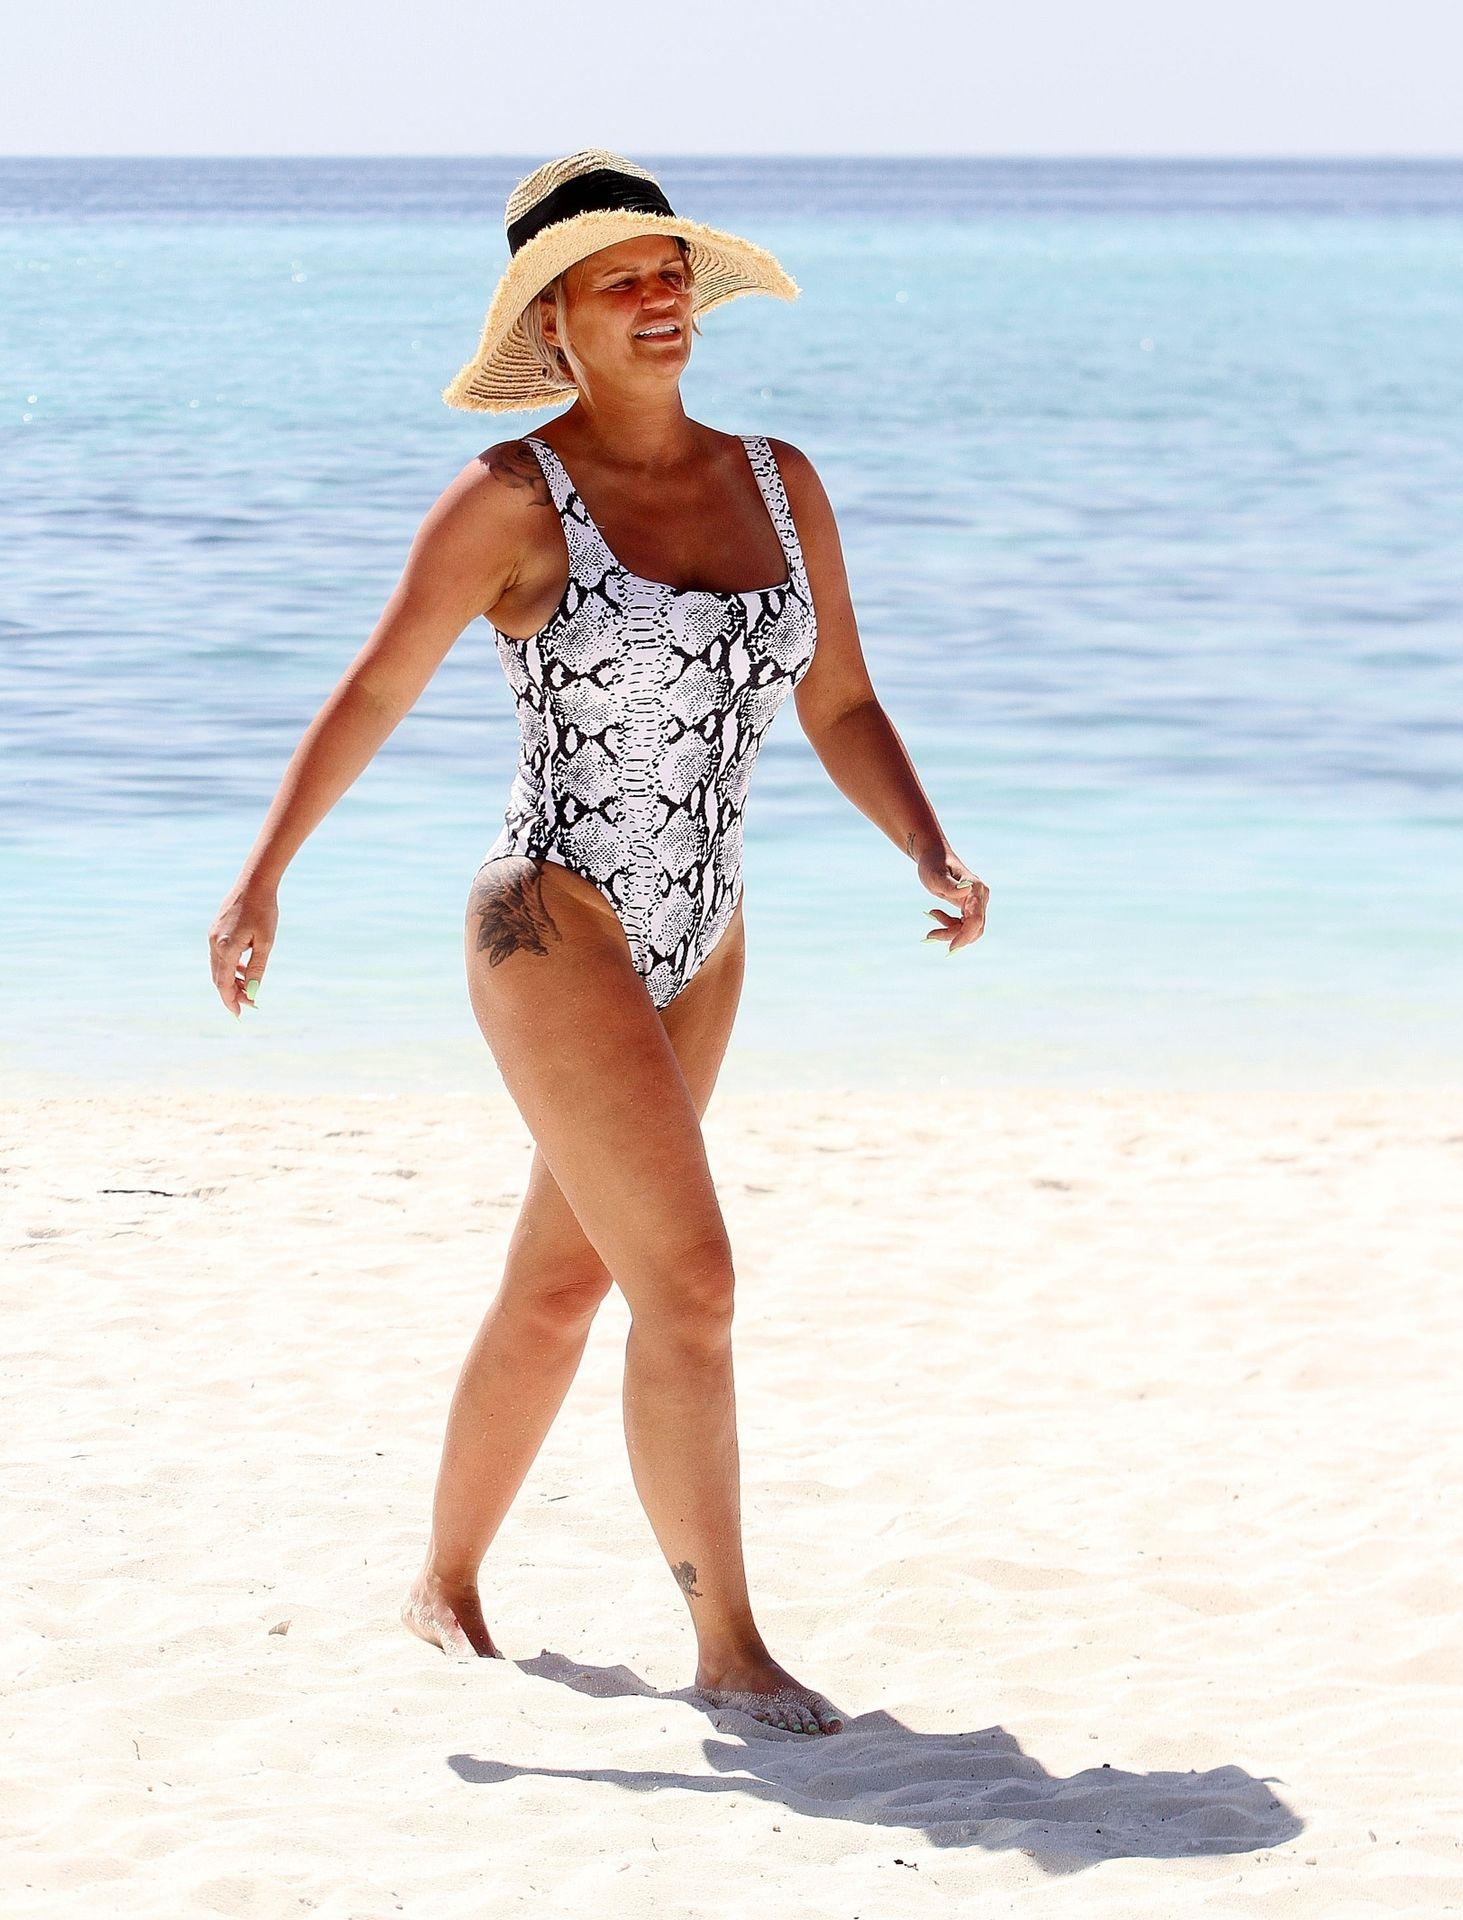 Kerry Katona & Ryan Mahoney Hit The Beach On Holiday At Their Luxury 5 Star Resort Ayada Maldives 0006